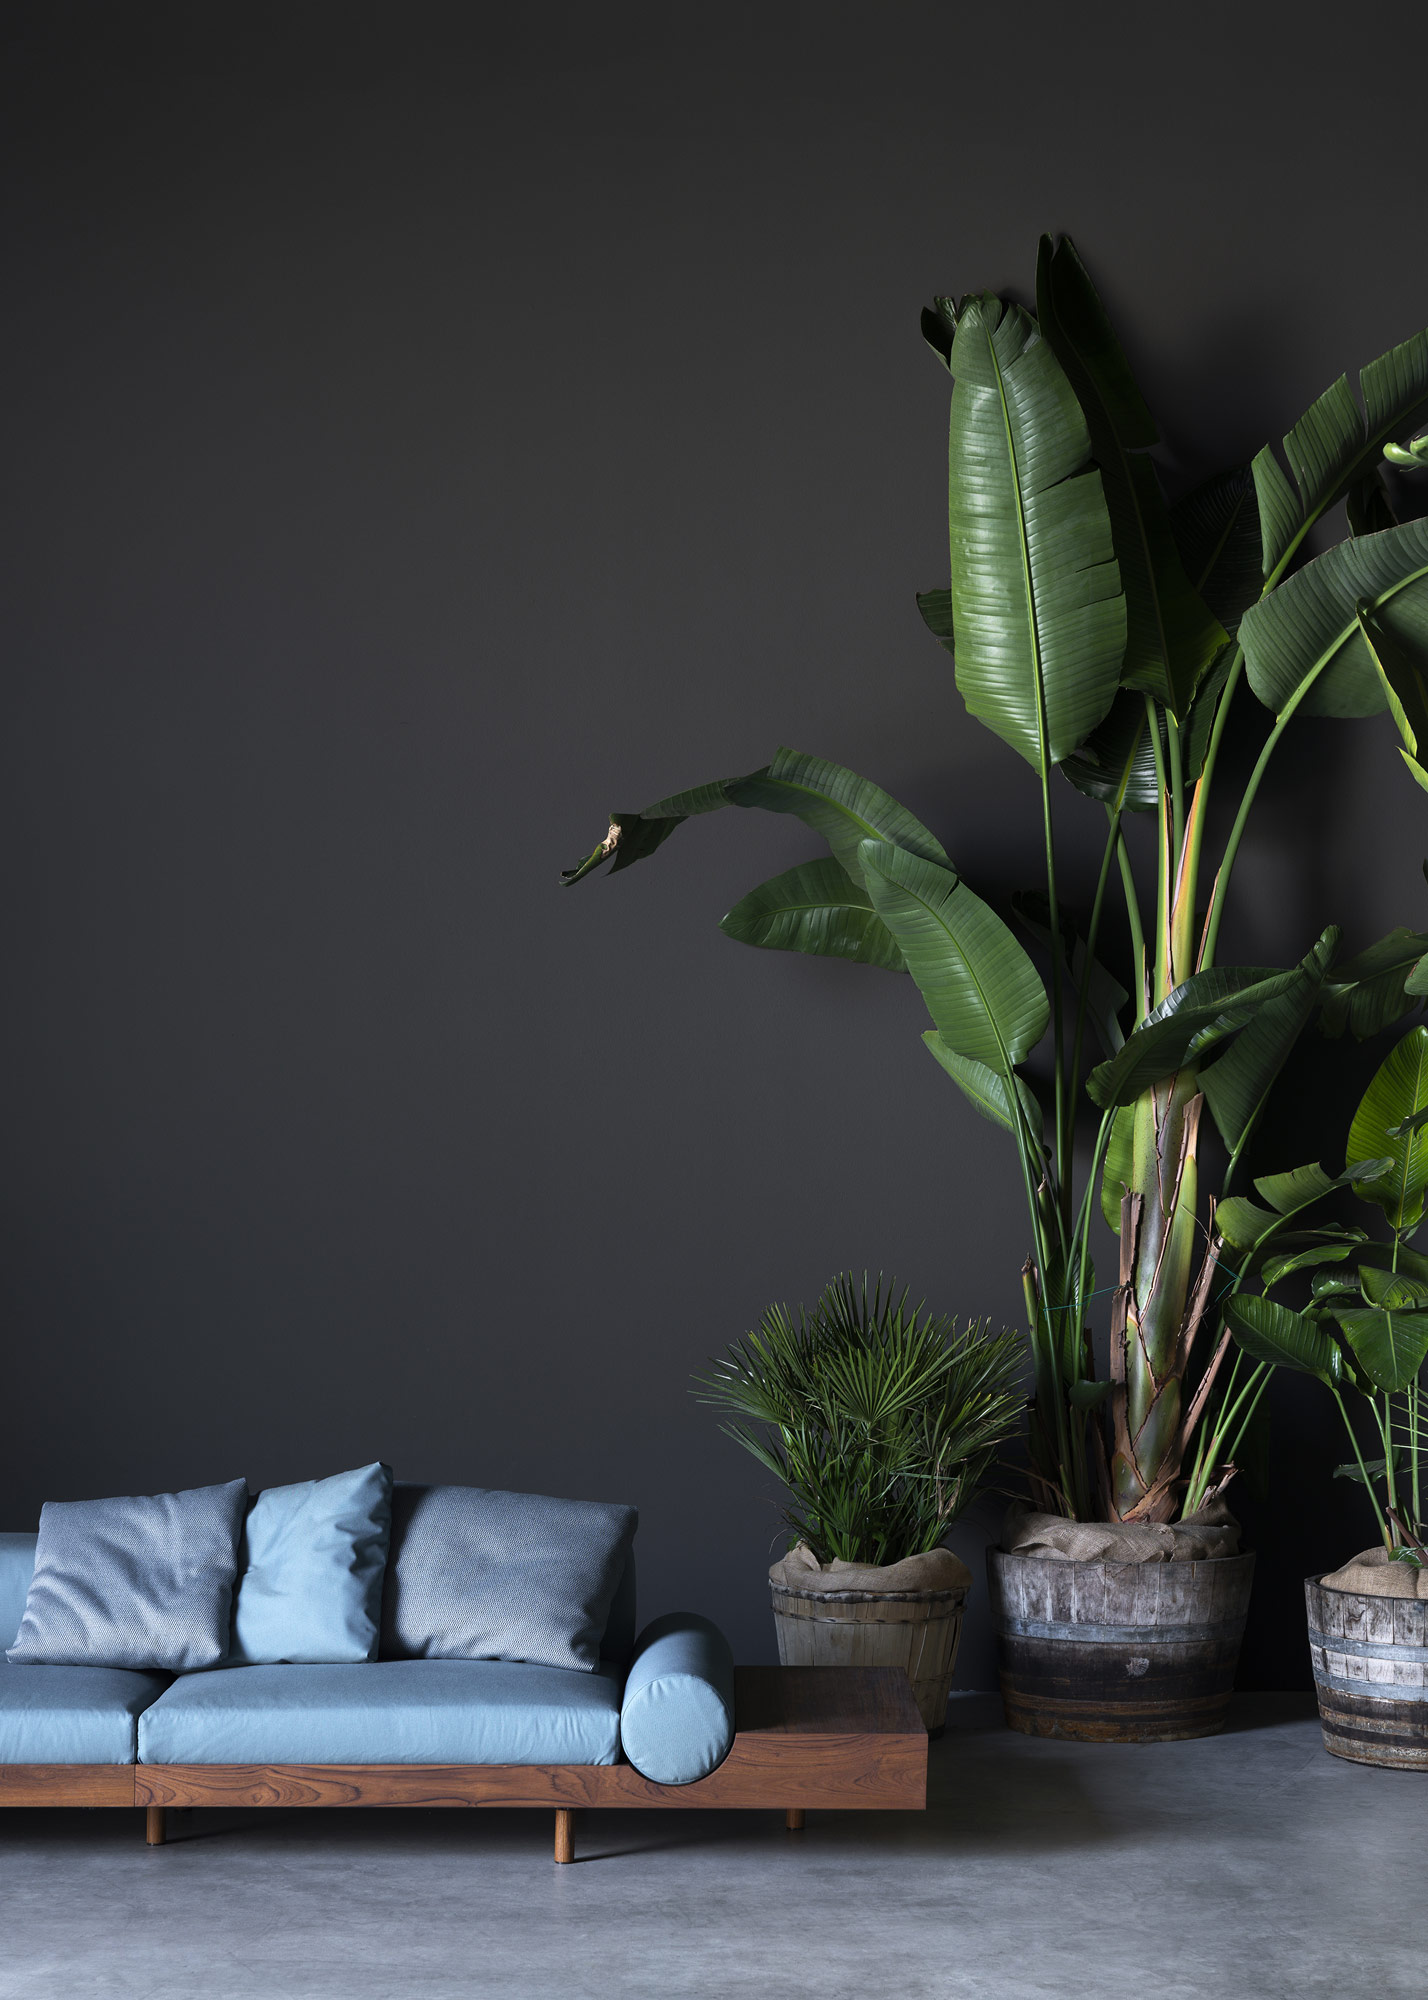 Outdoor-Sofa von David Lopez Quincoces für Living Divani